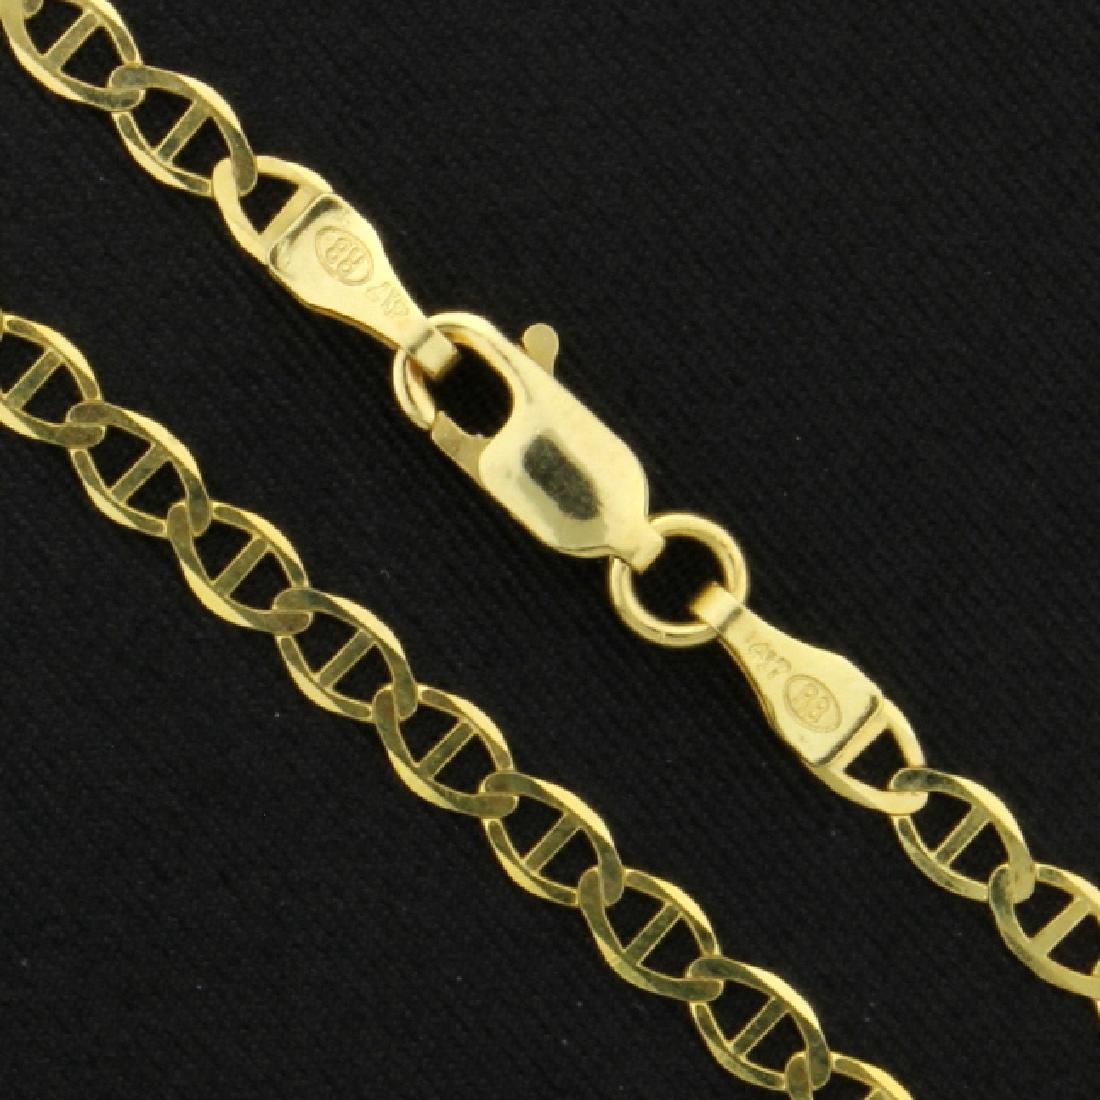 Italian Made 24 1/4 Inch Anchor Chain - 2